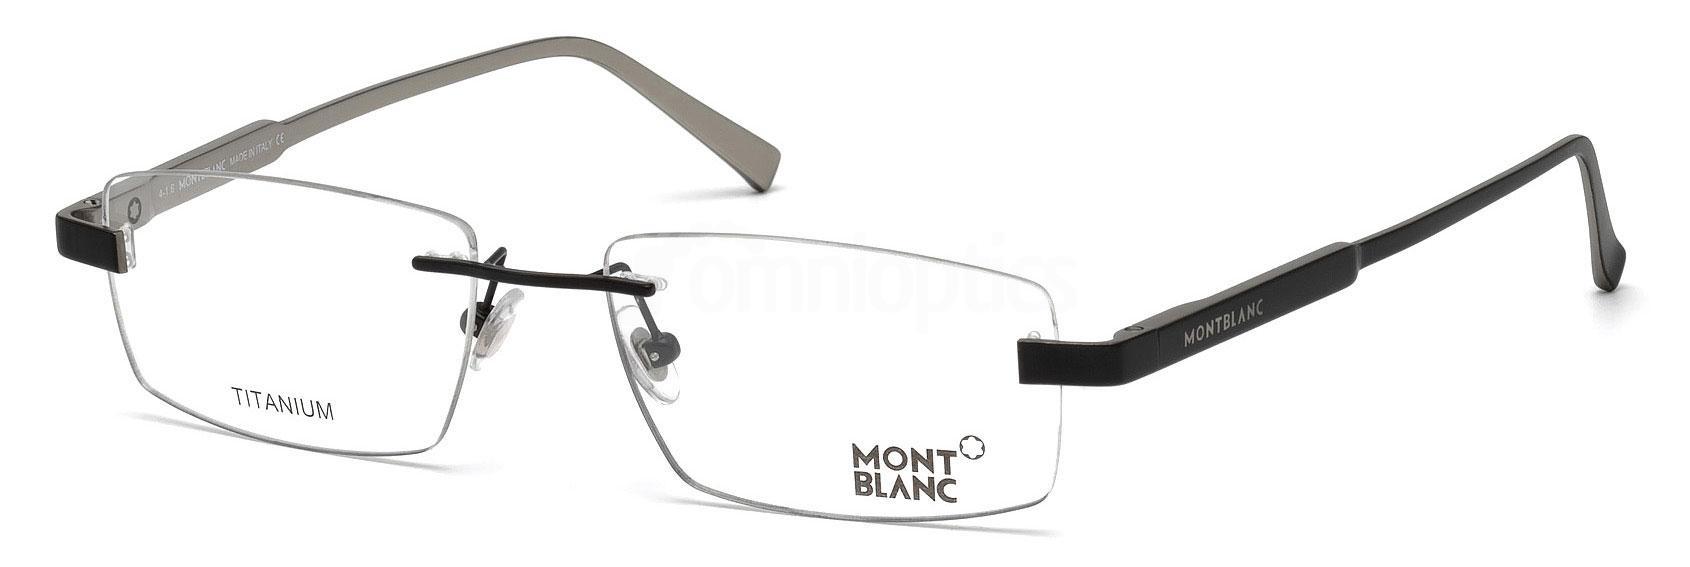 002 MB0661 , Mont Blanc